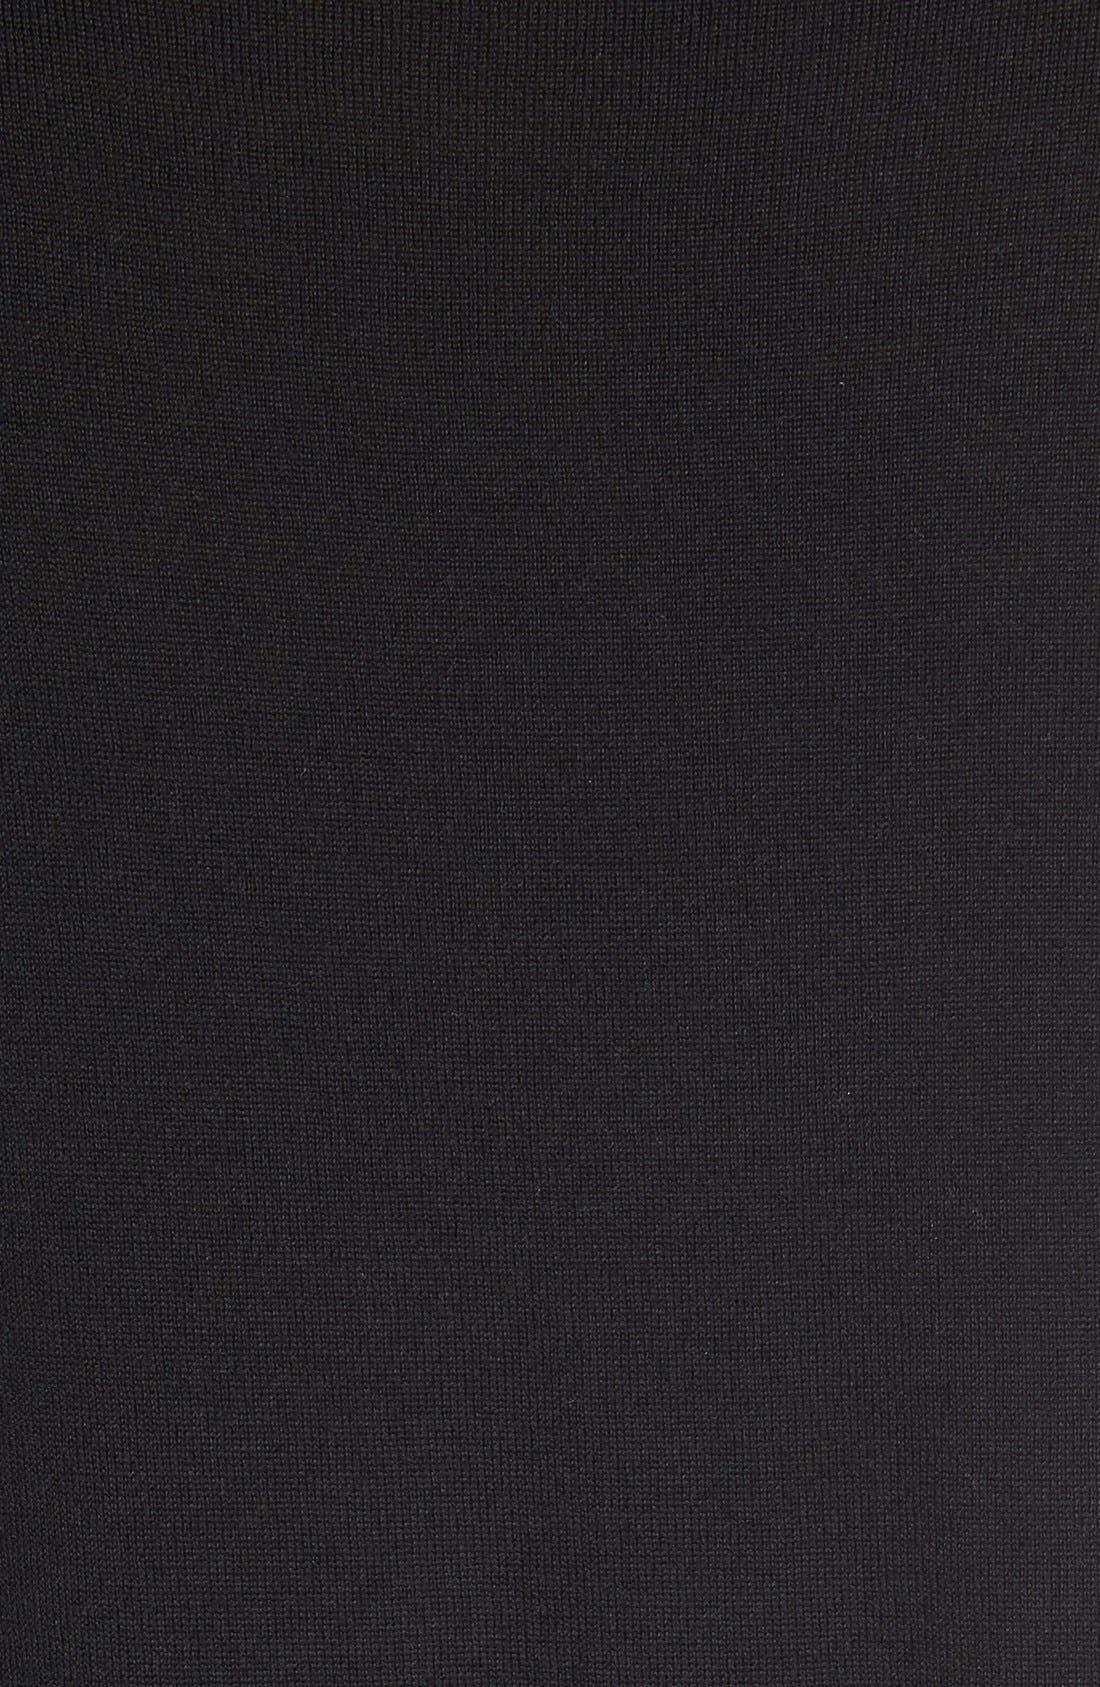 Superfine Merino Wool Sweater,                             Alternate thumbnail 3, color,                             Black